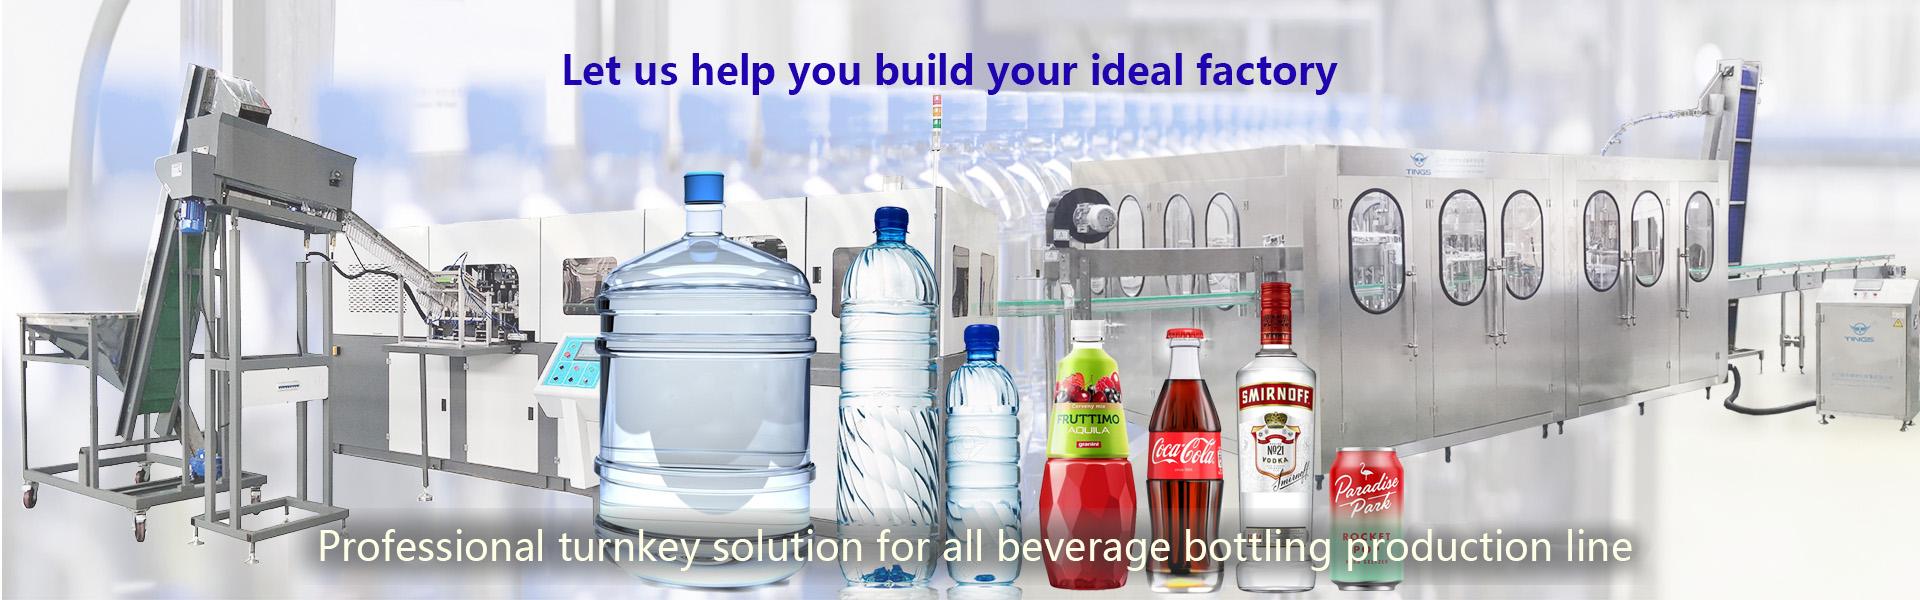 01 Professional Turnkey Solution For All Beverage Bottling Production Line